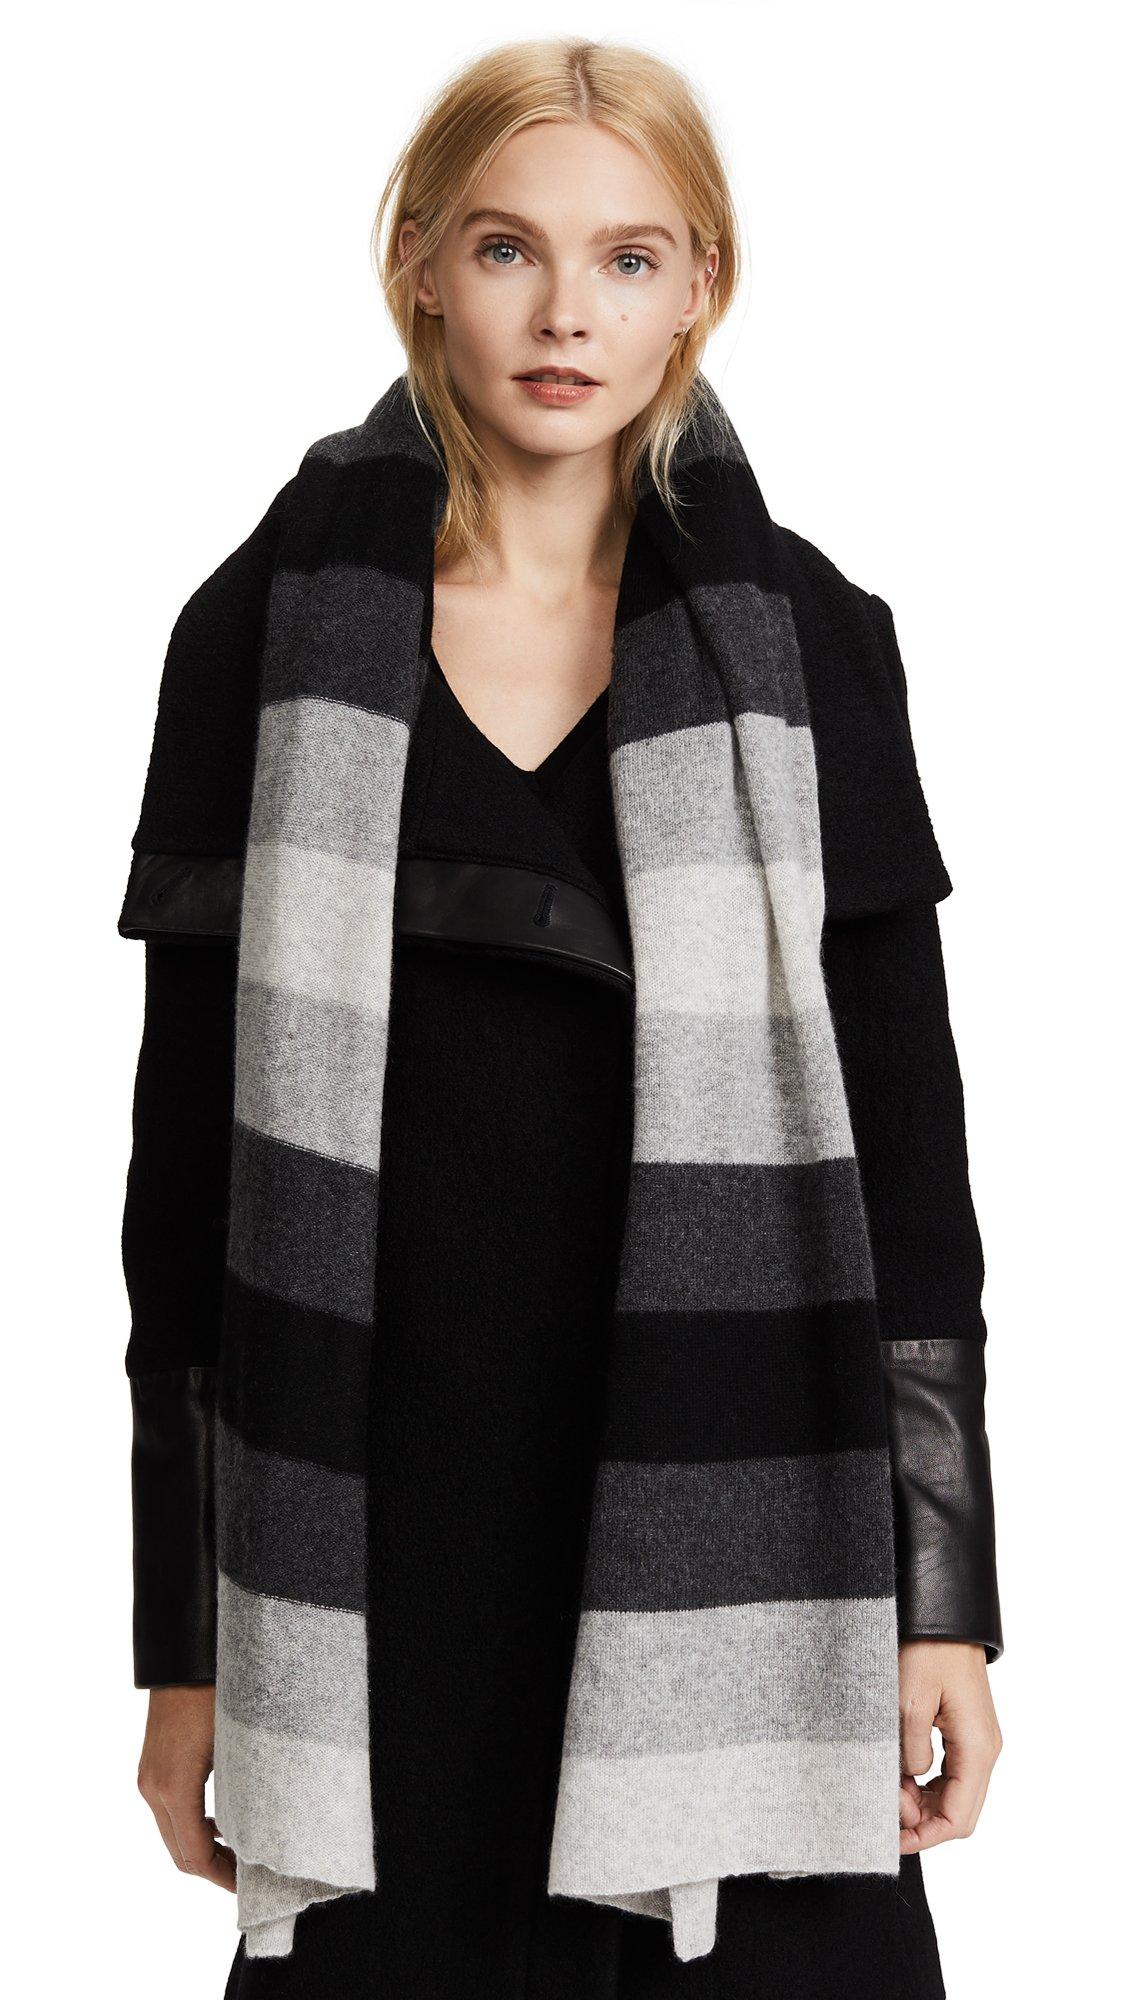 White + Warren Women's Cashmere Ombre Stripe Scarf, Black Multi, One Size by White + Warren